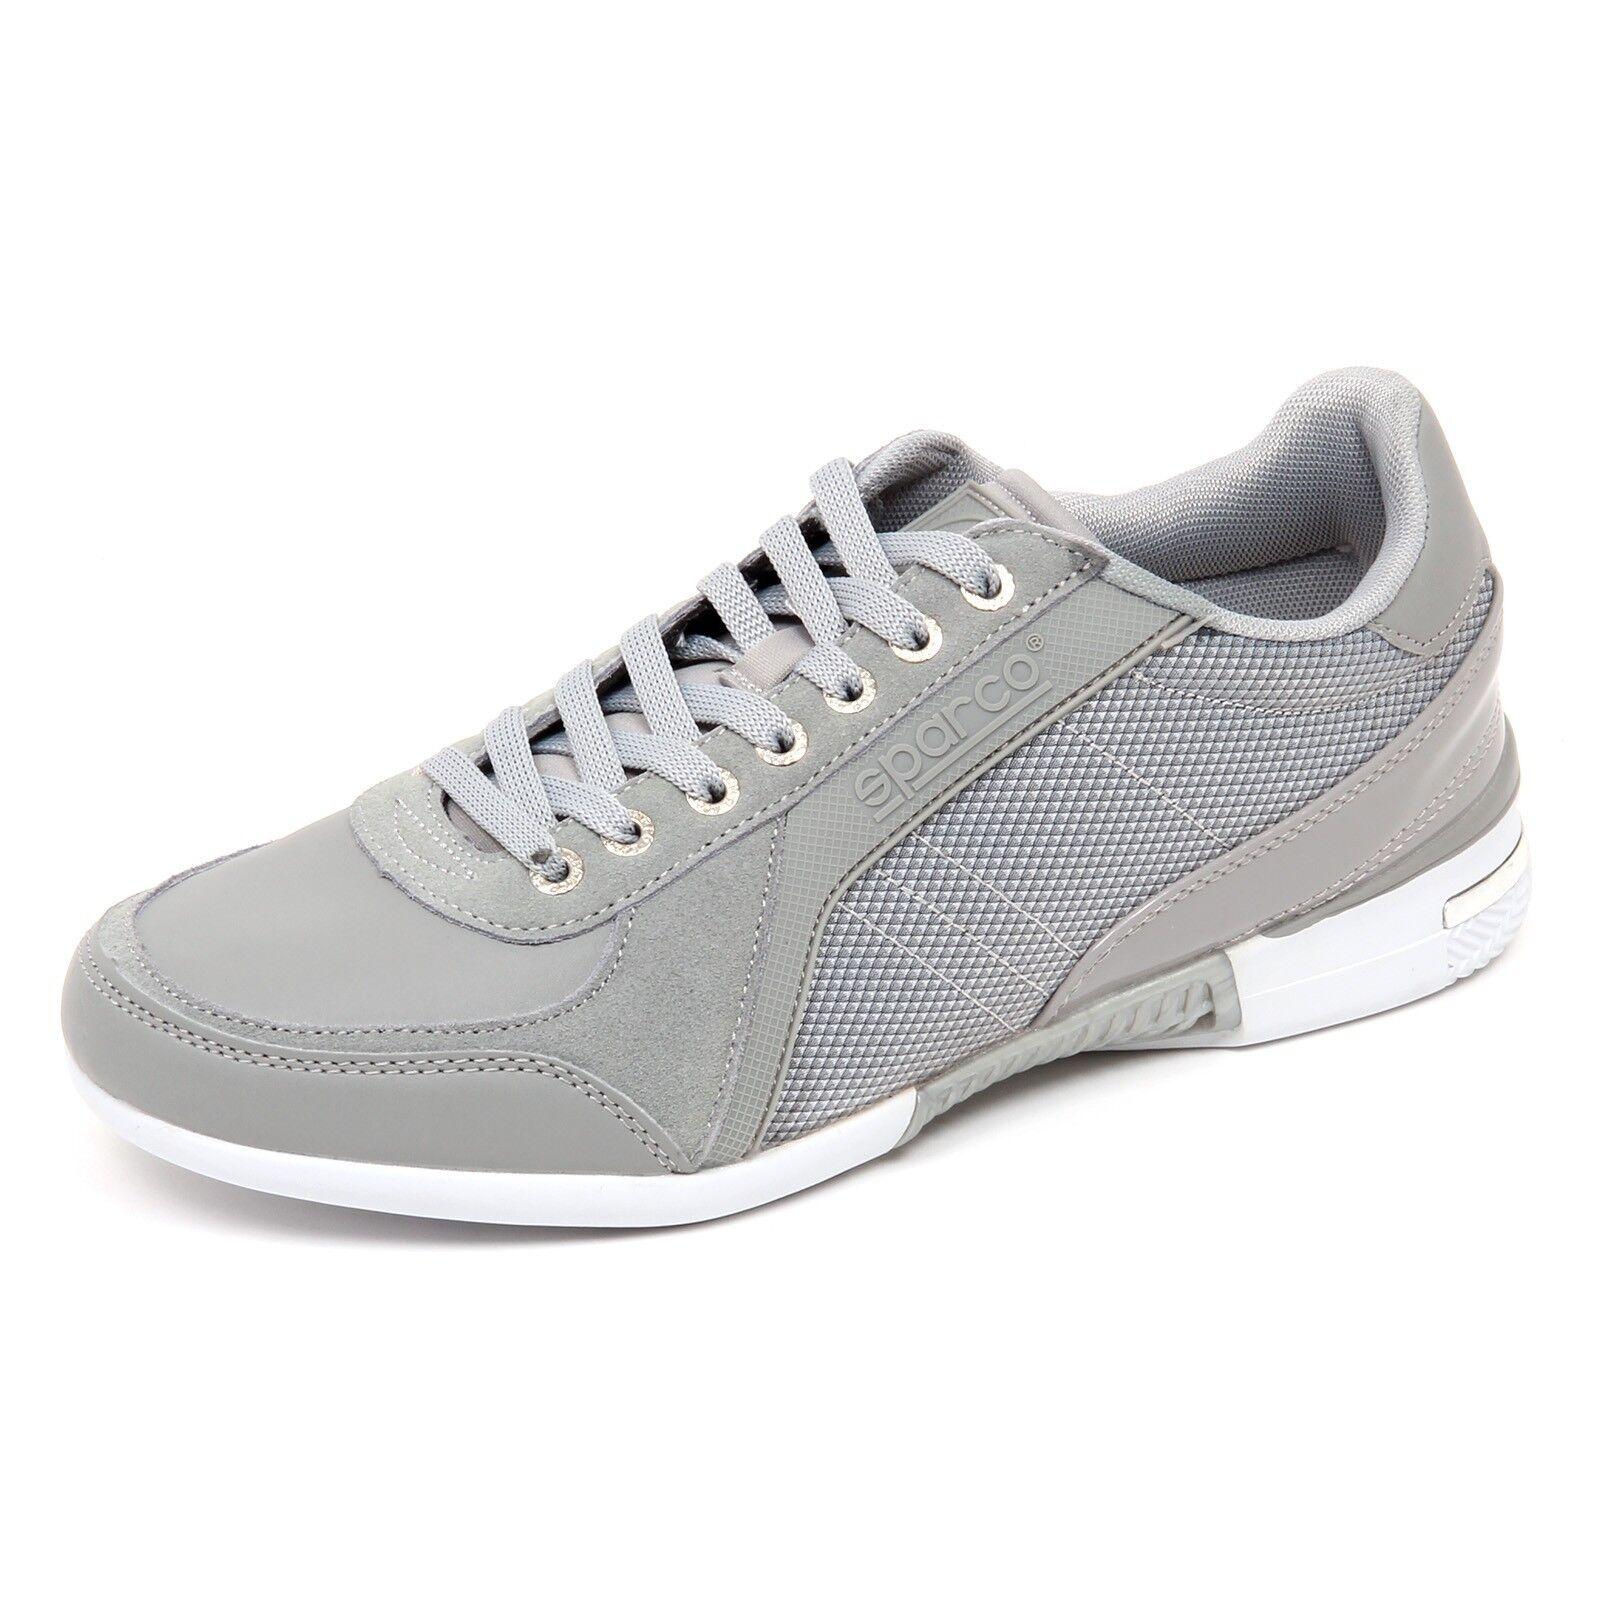 D2906 sneaker grigio Zapatos hombre tissue SPARCO Zapatos grigio grigio sneaker 18d234